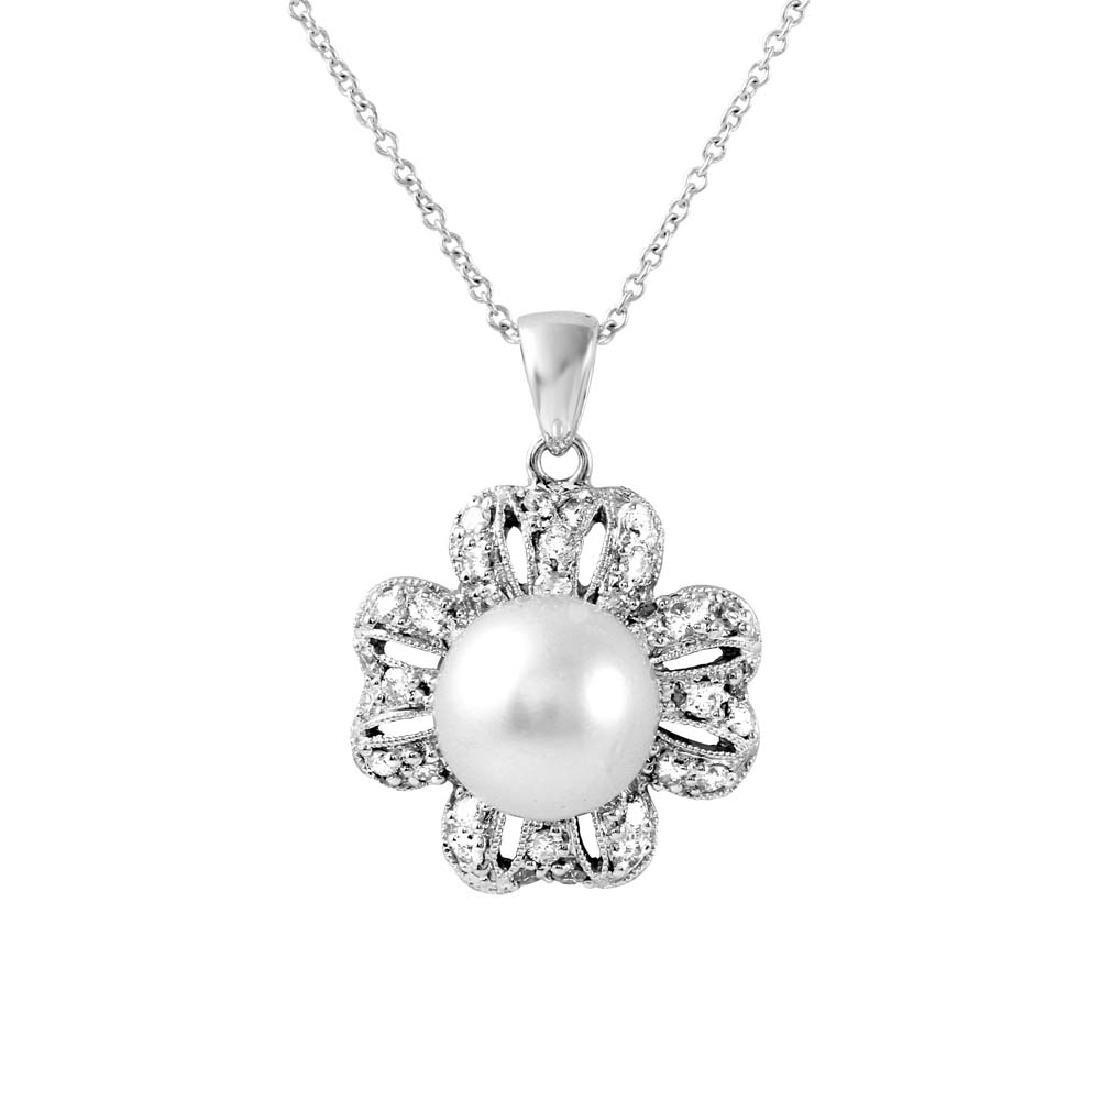 Genuine 5.86 TCW 18K White Gold Ladies Necklace